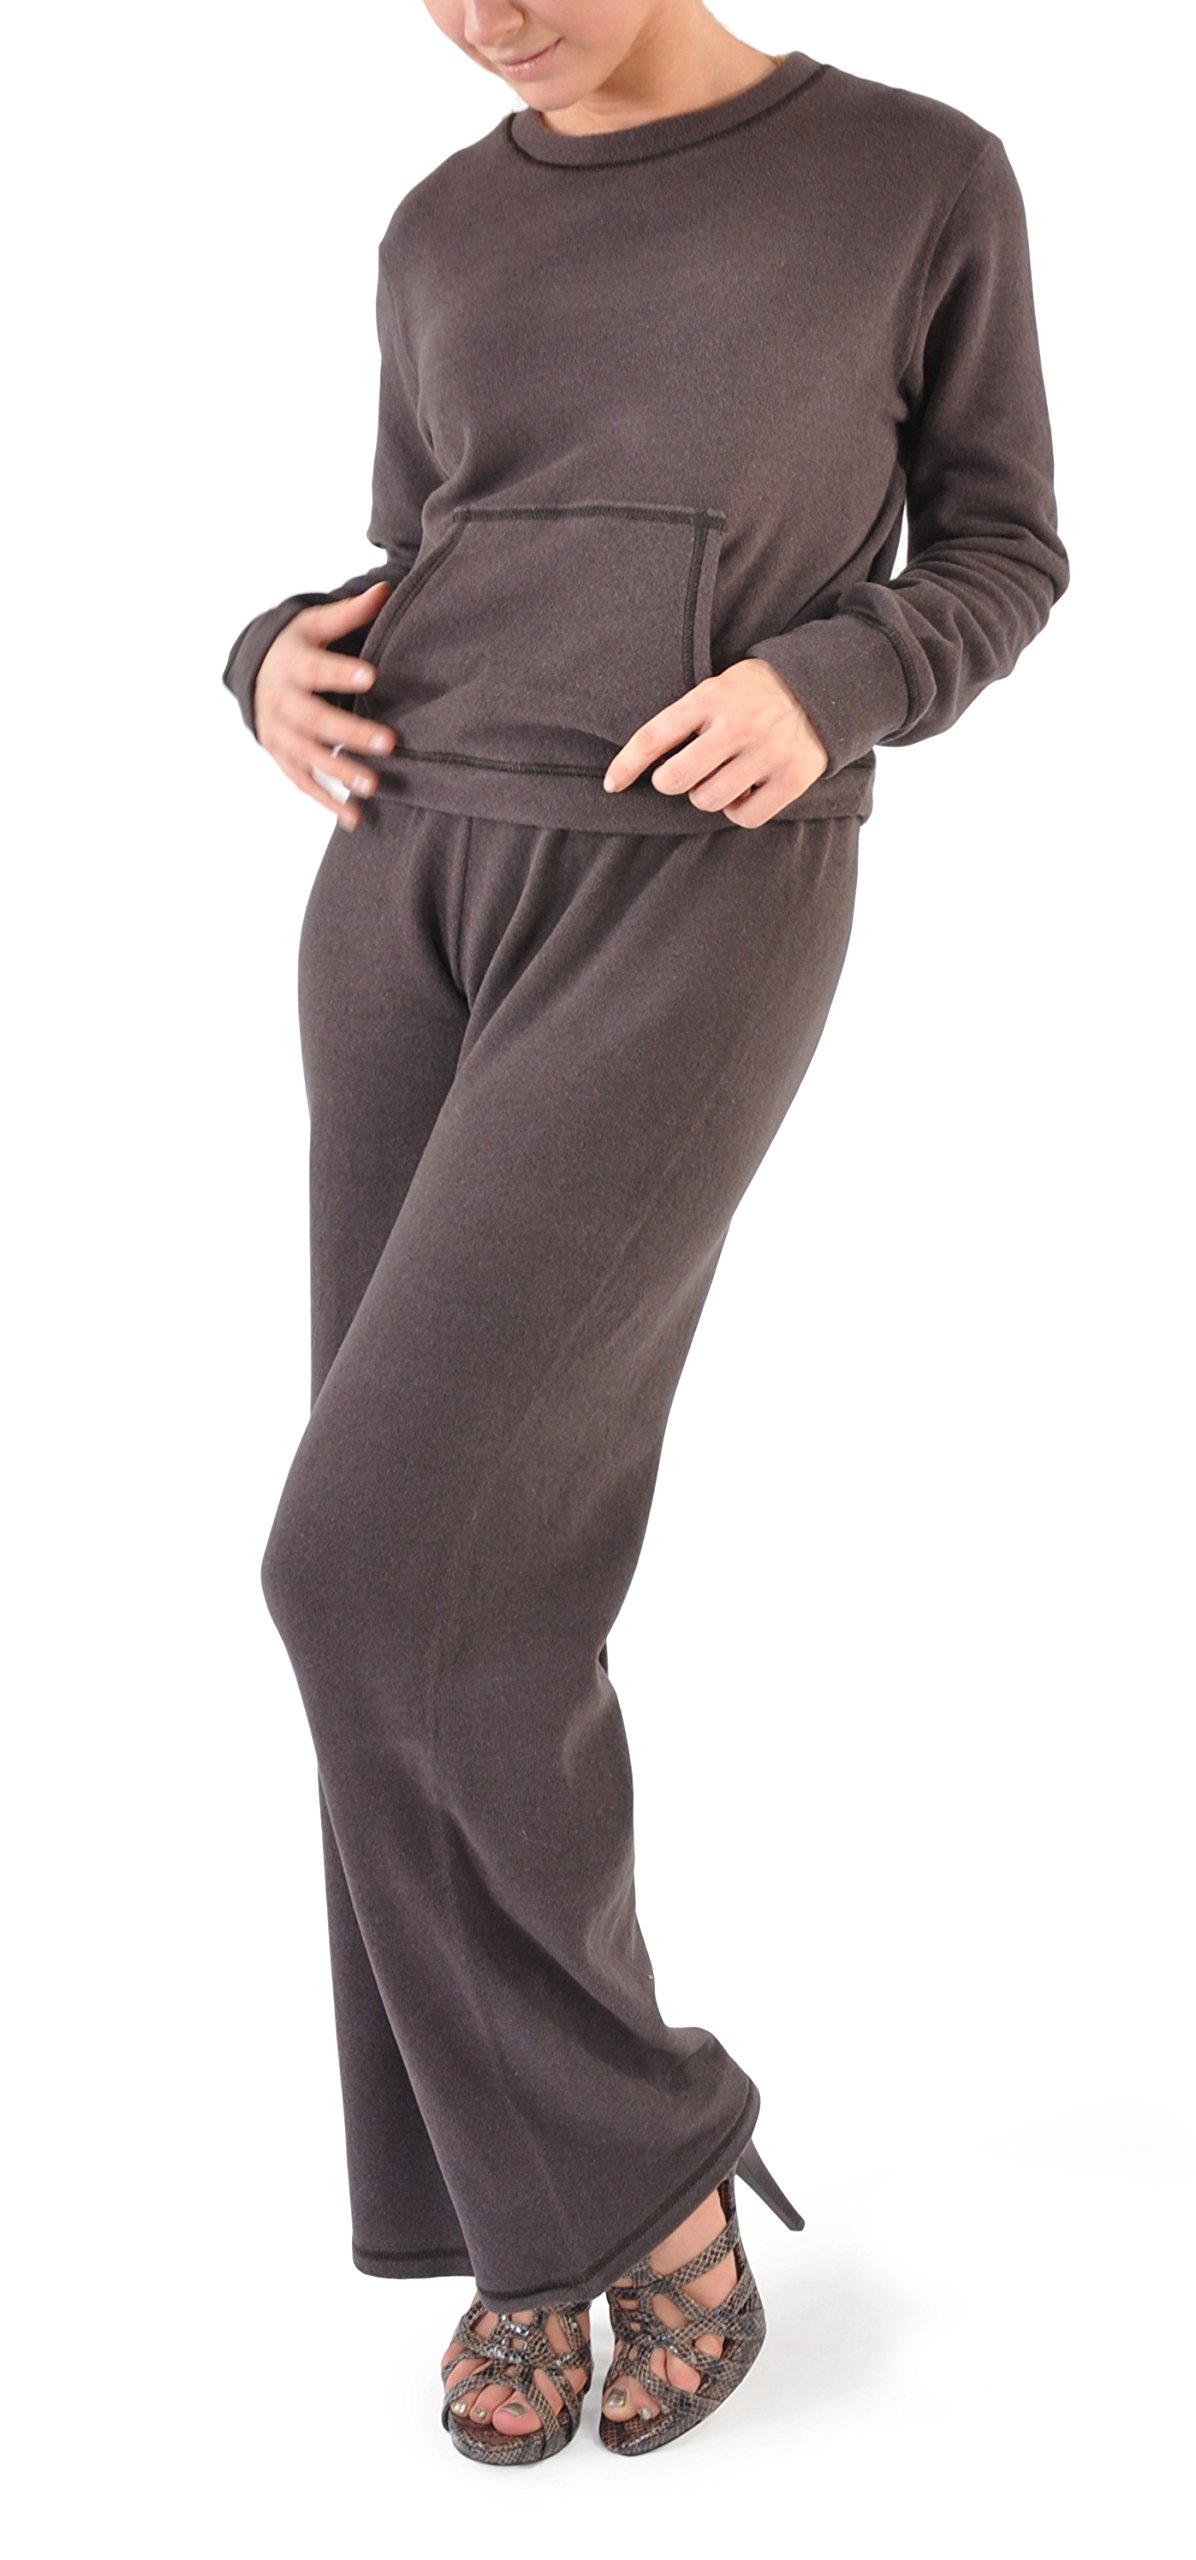 Zimmerli Luxury Loungewear/Warm Ups - X-Large/Chocolate